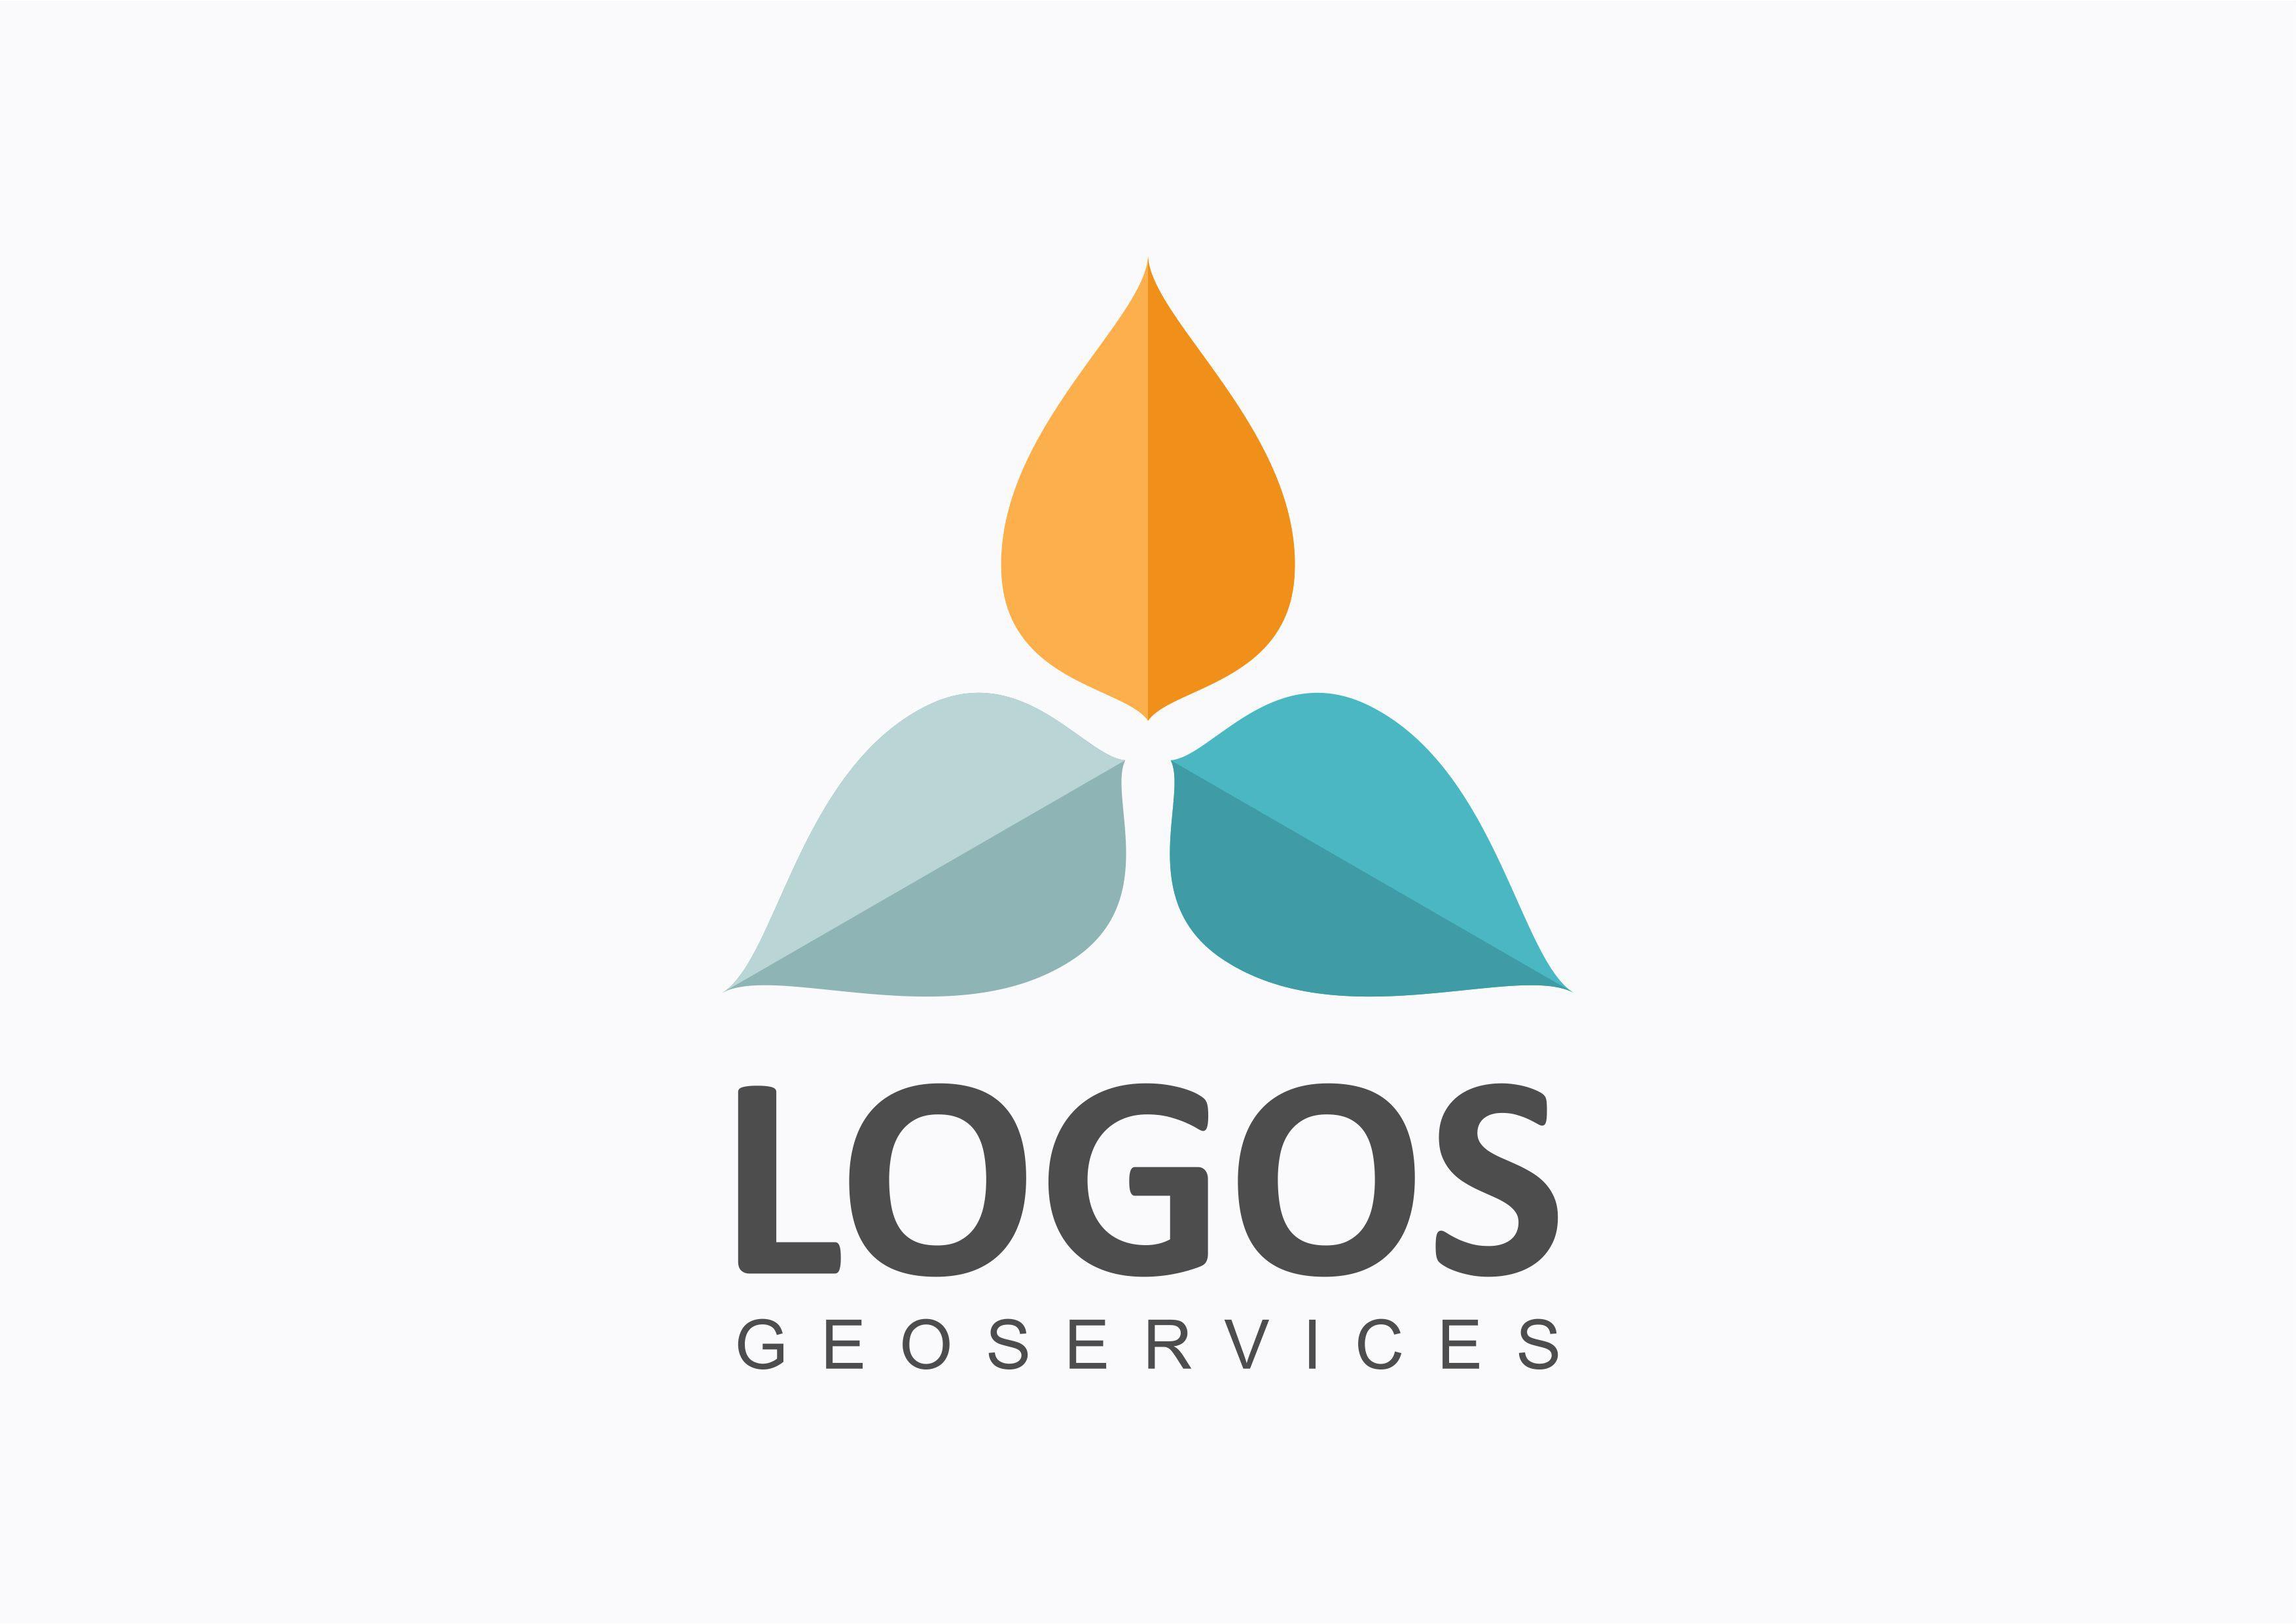 Logo design for a frontier renewable energy exploration company